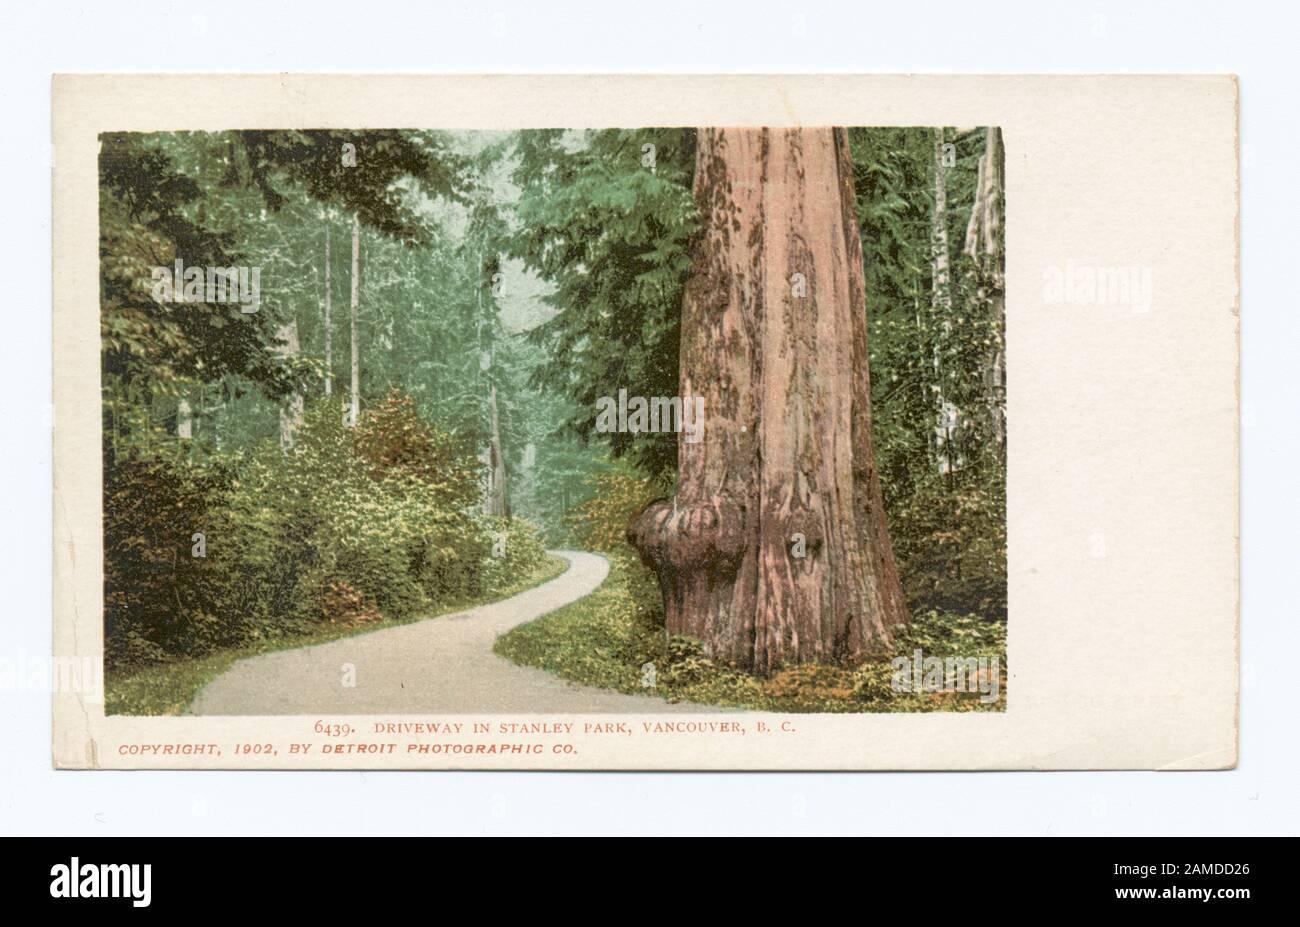 Driveway,Streets,Stanley Park,Vancouver,British Columbia,Detroit Publishing,1902 Photo